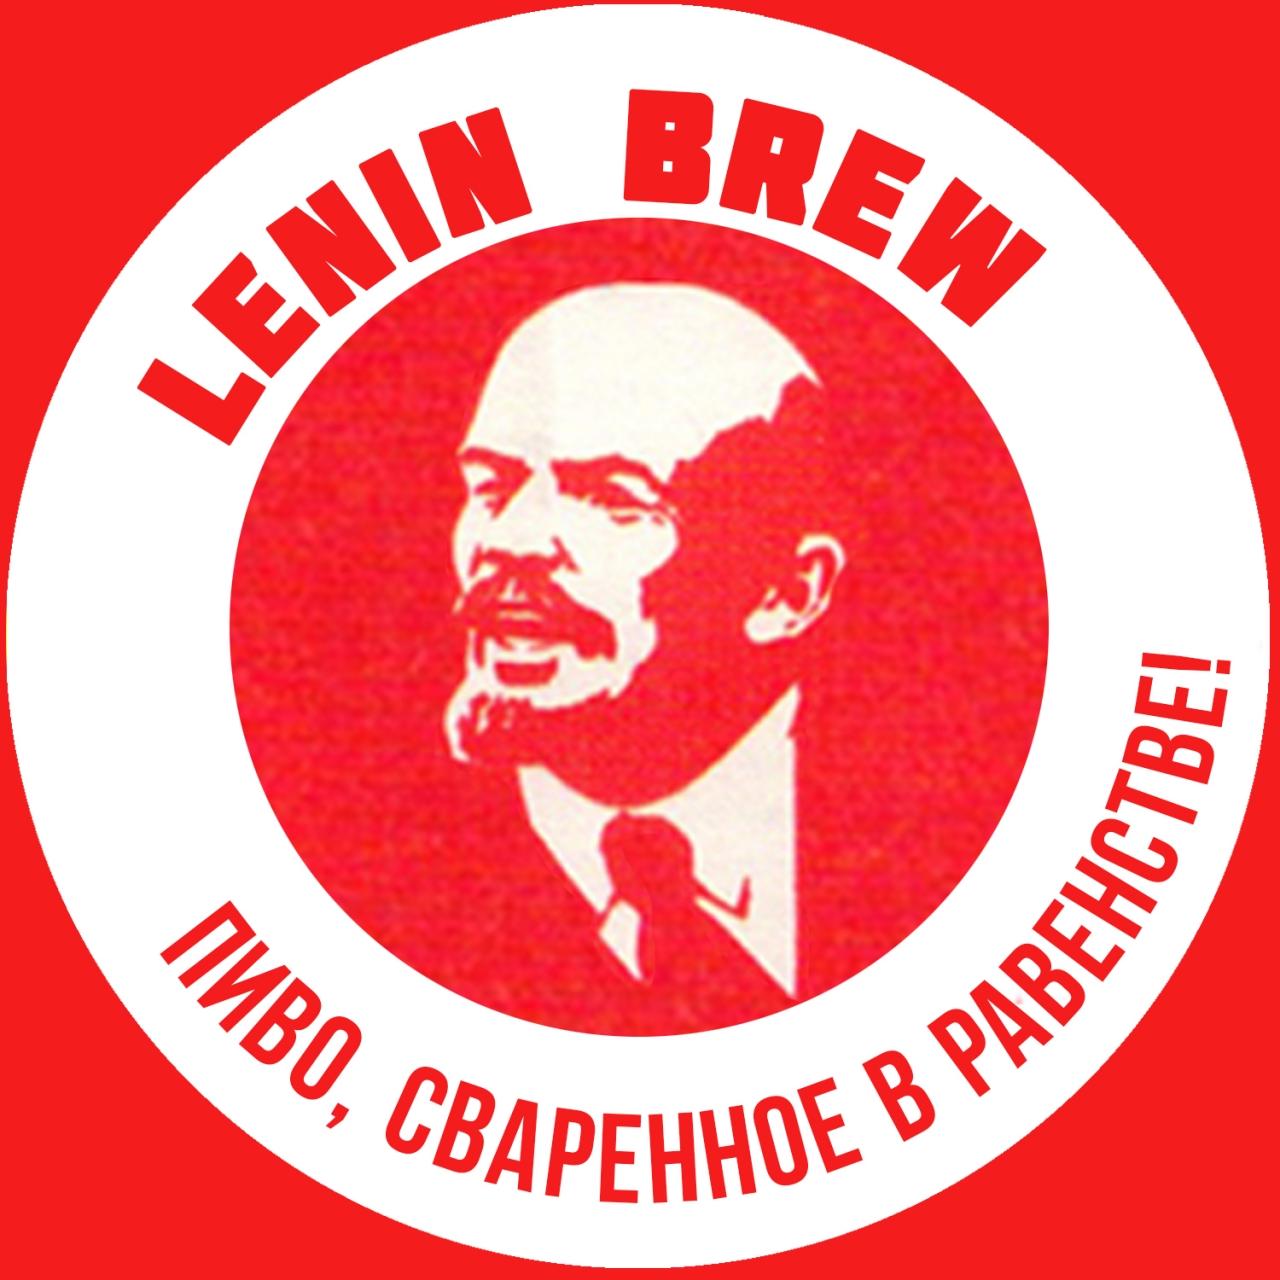 Lenin Brew